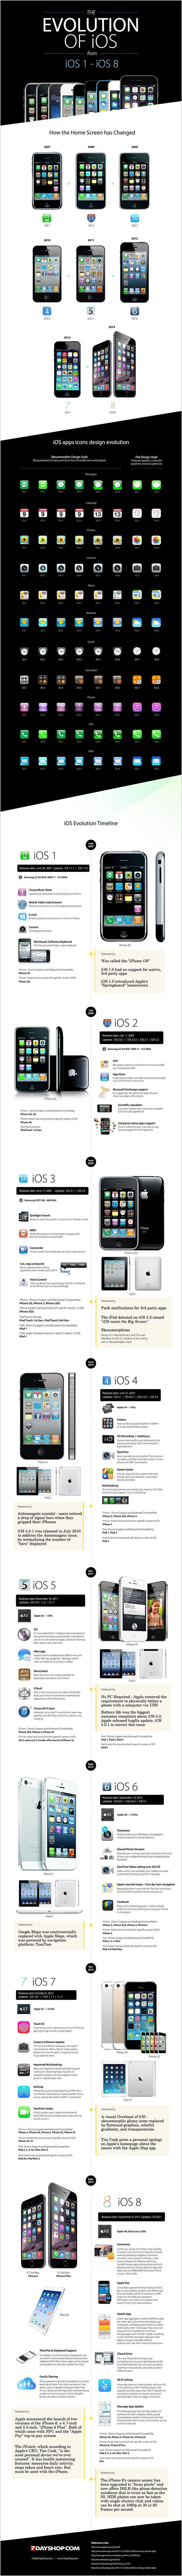 iOS 1 to iOS 8: How Has Apple's Operating System Evolved? (scheduled via http://www.tailwindapp.com?utm_source=pinterest&utm_medium=twpin&utm_content=post11675358&utm_campaign=scheduler_attribution)